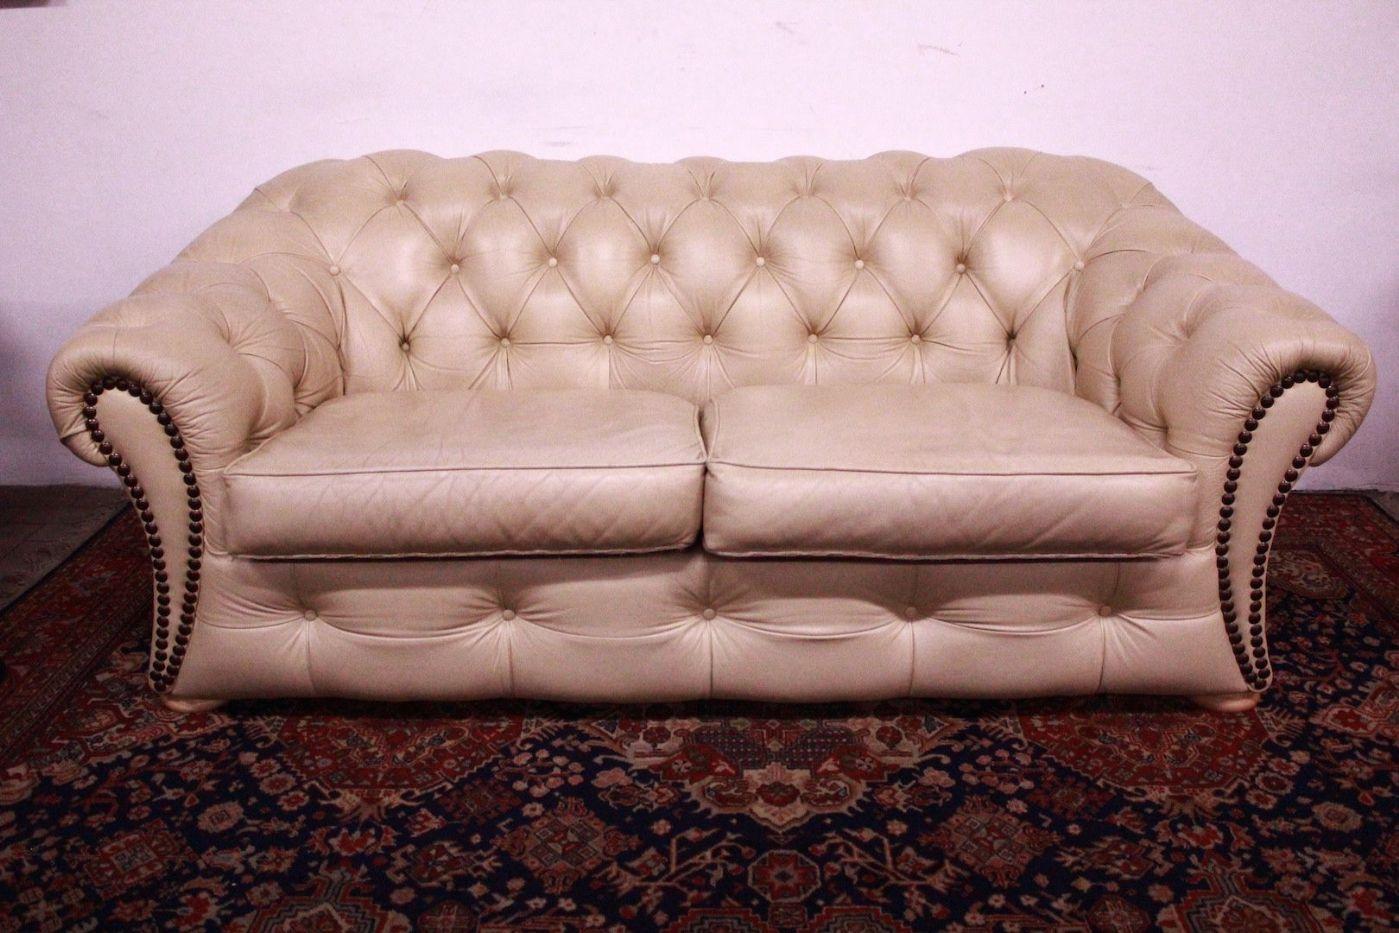 bel chesterfield sofa chester 3 pl tze englisch original ledercreme antiquit ten auf. Black Bedroom Furniture Sets. Home Design Ideas